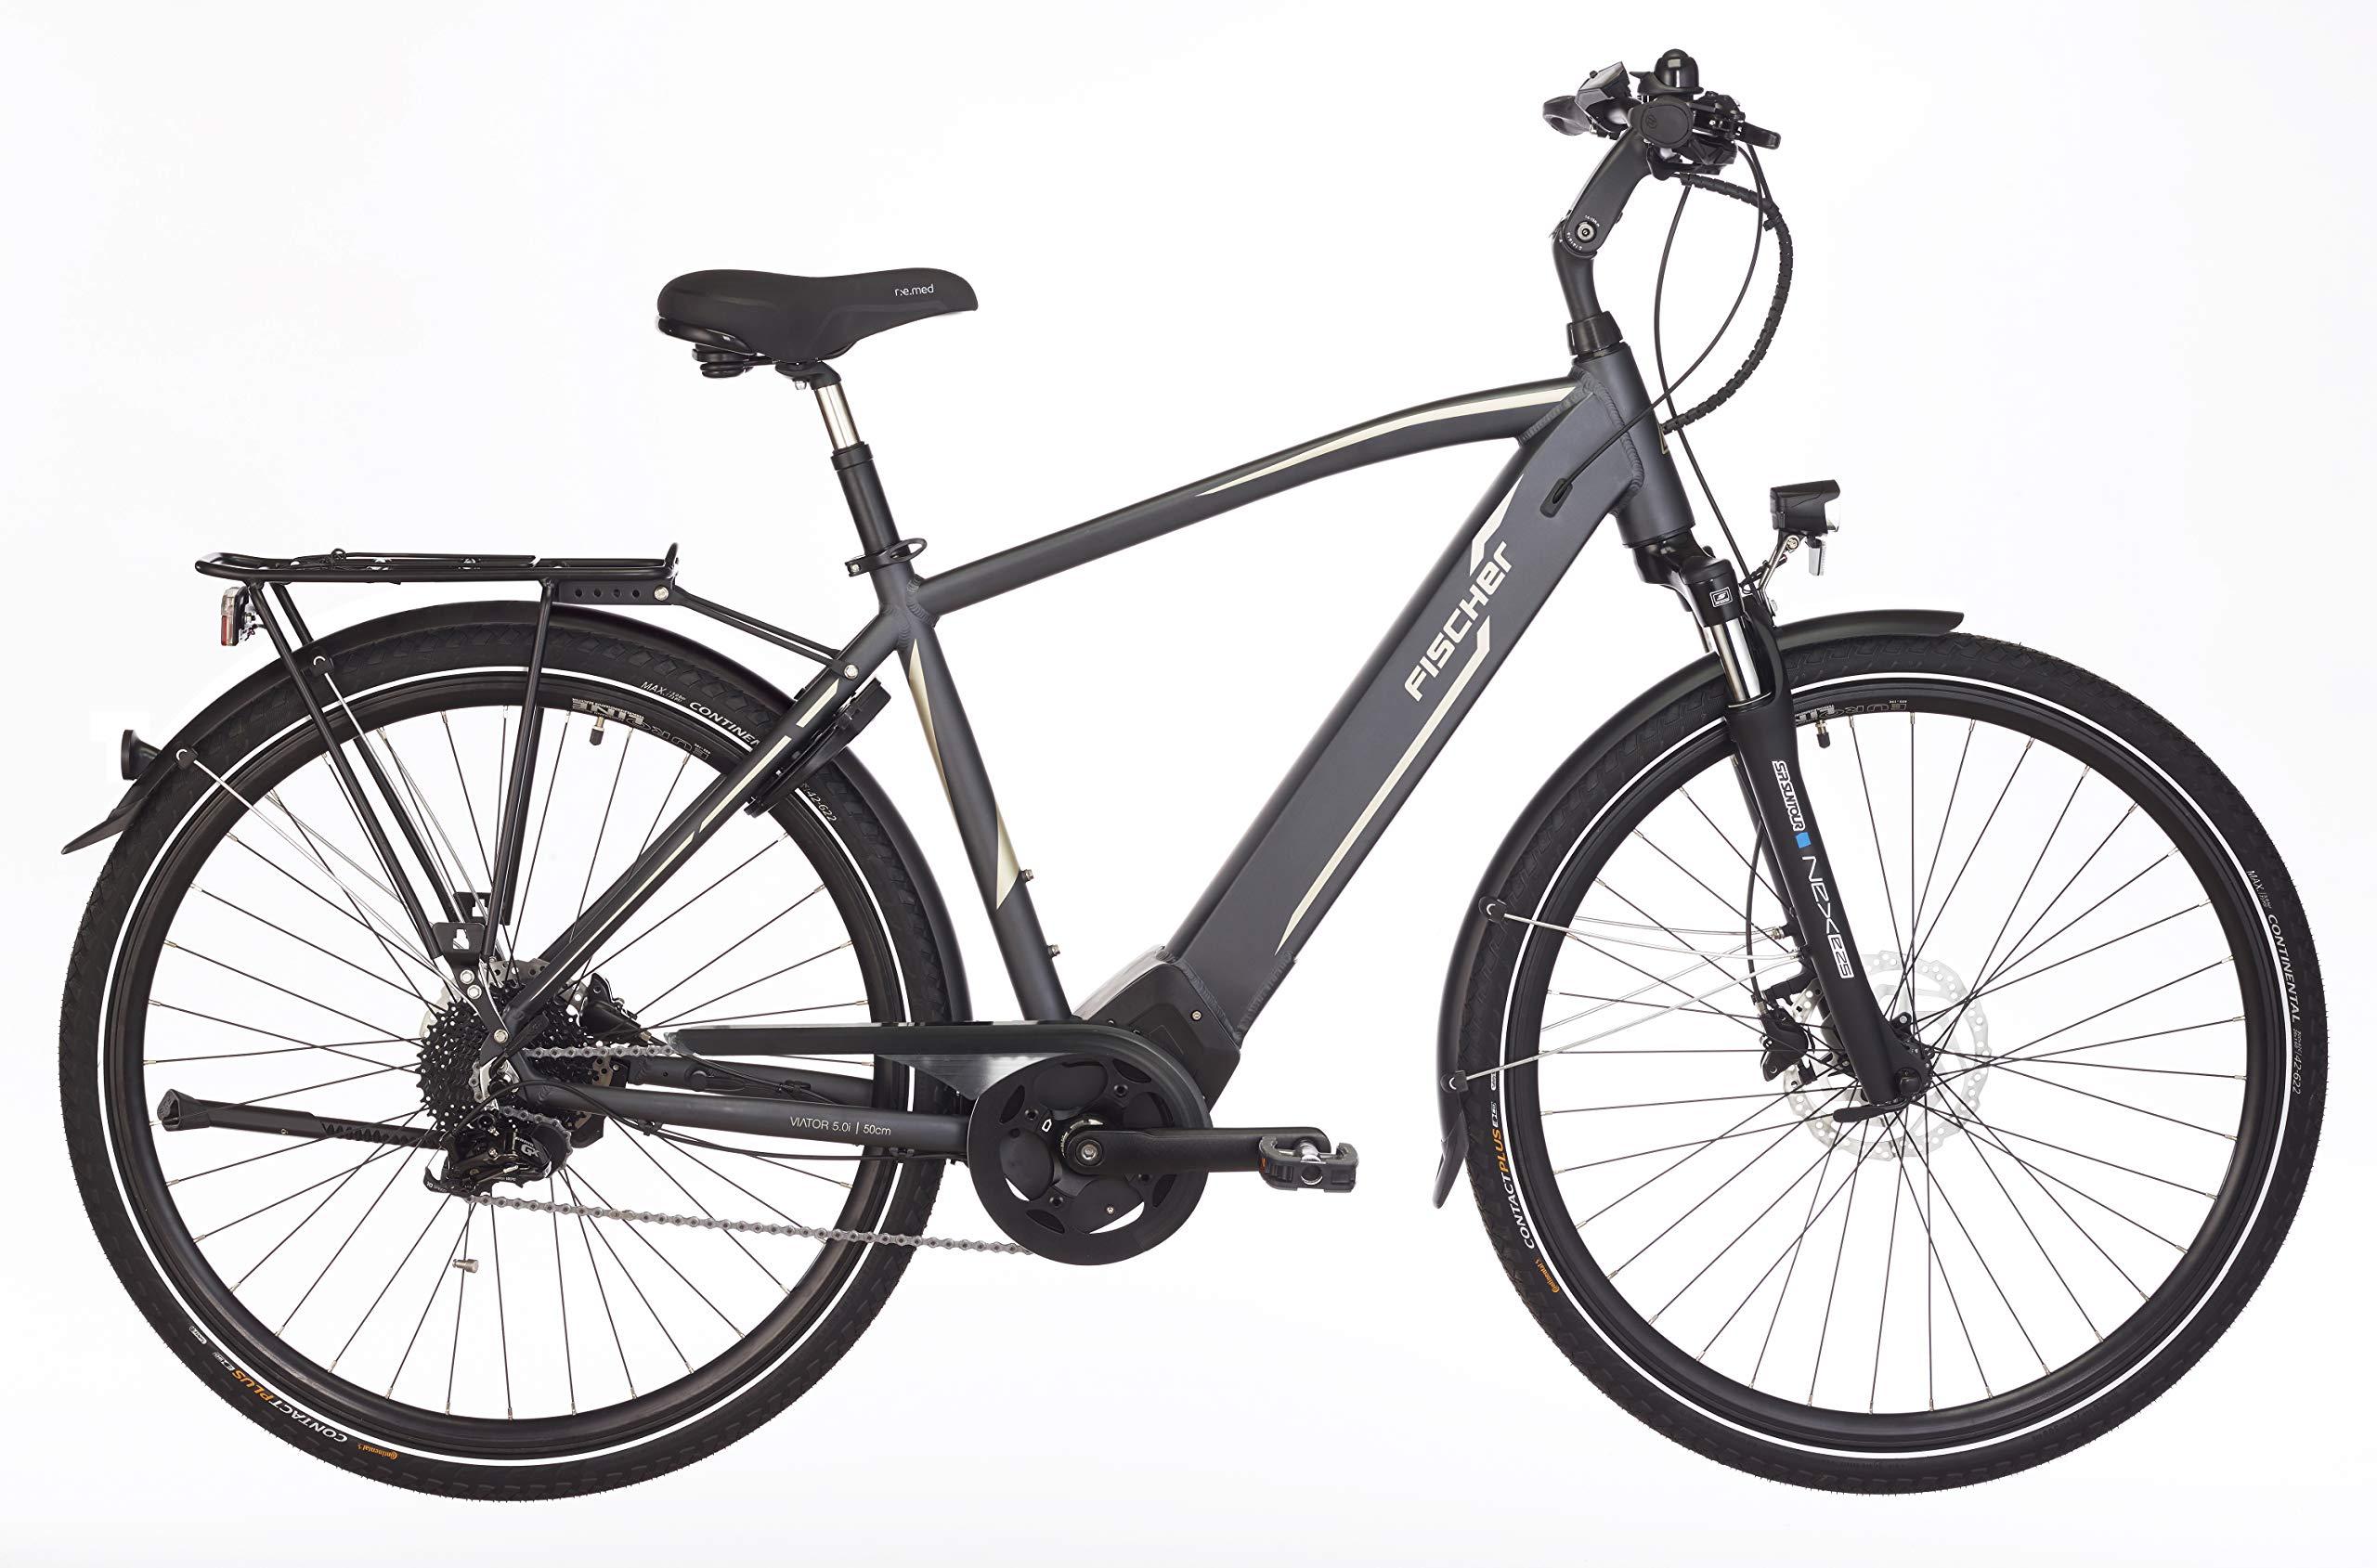 Fischer VIATOR 5.0i (2019) 28 Zoll Herren Trekking E-Bike, RH 50 cm, grau, Brose Mittelmotor